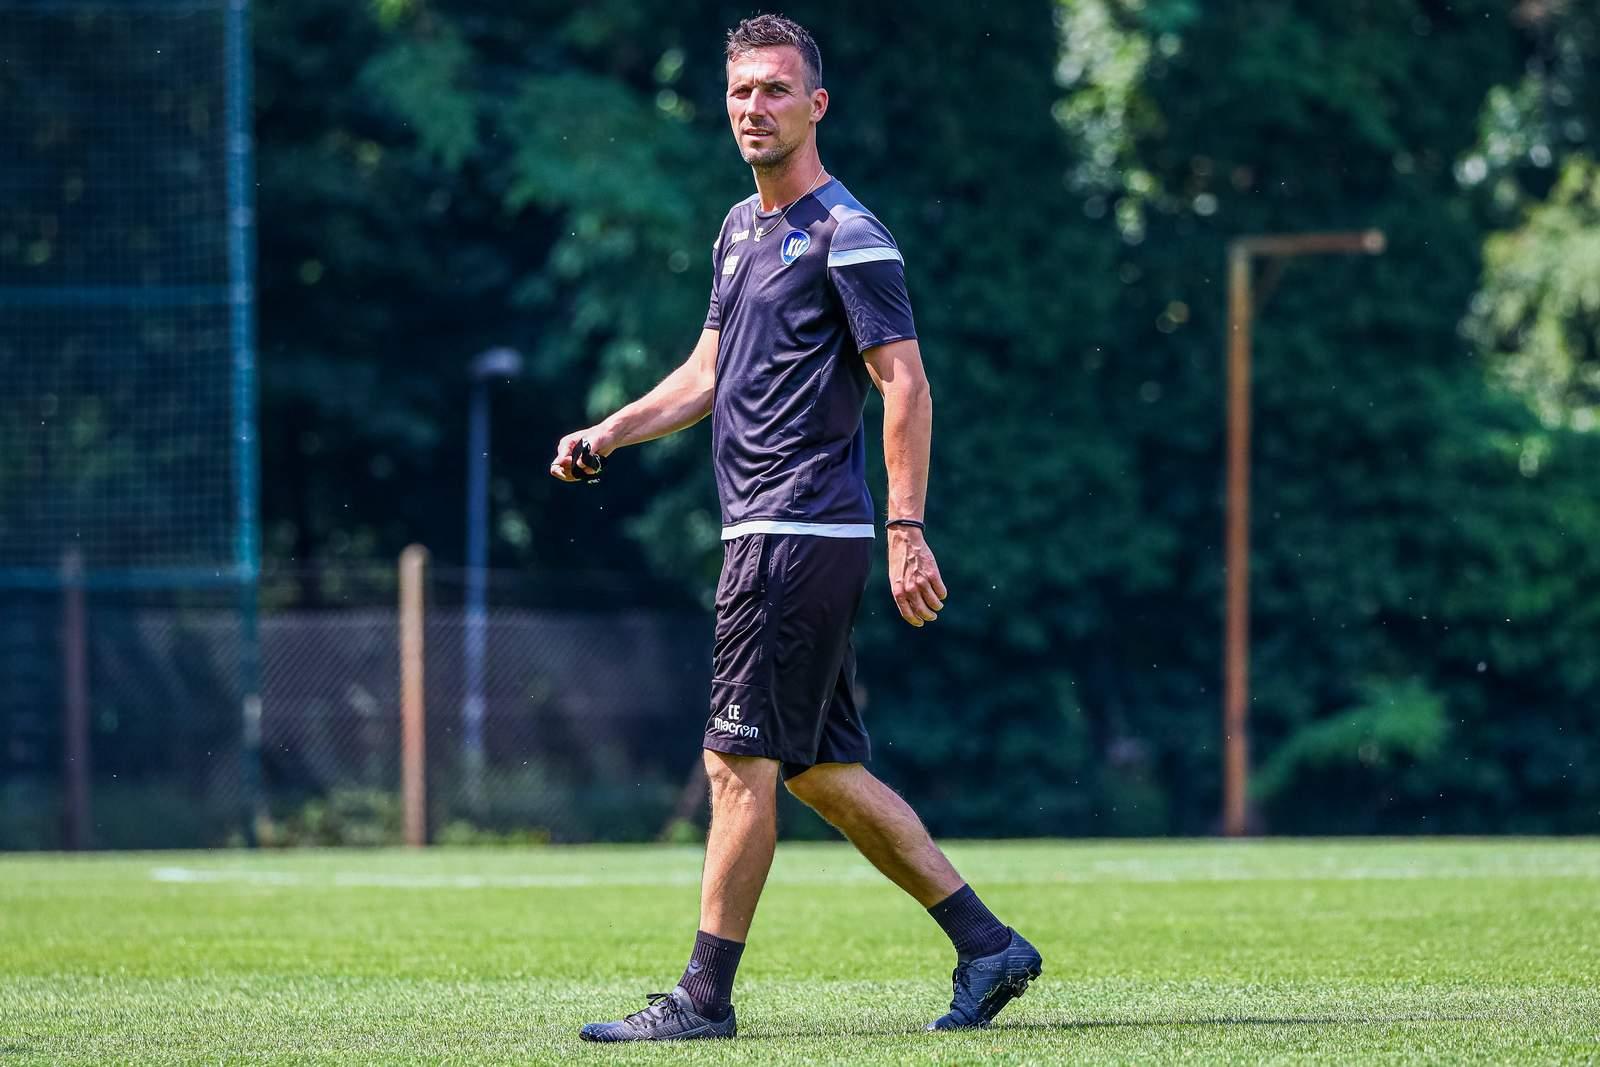 Christian Eichner auf dem Trainingsplatz.